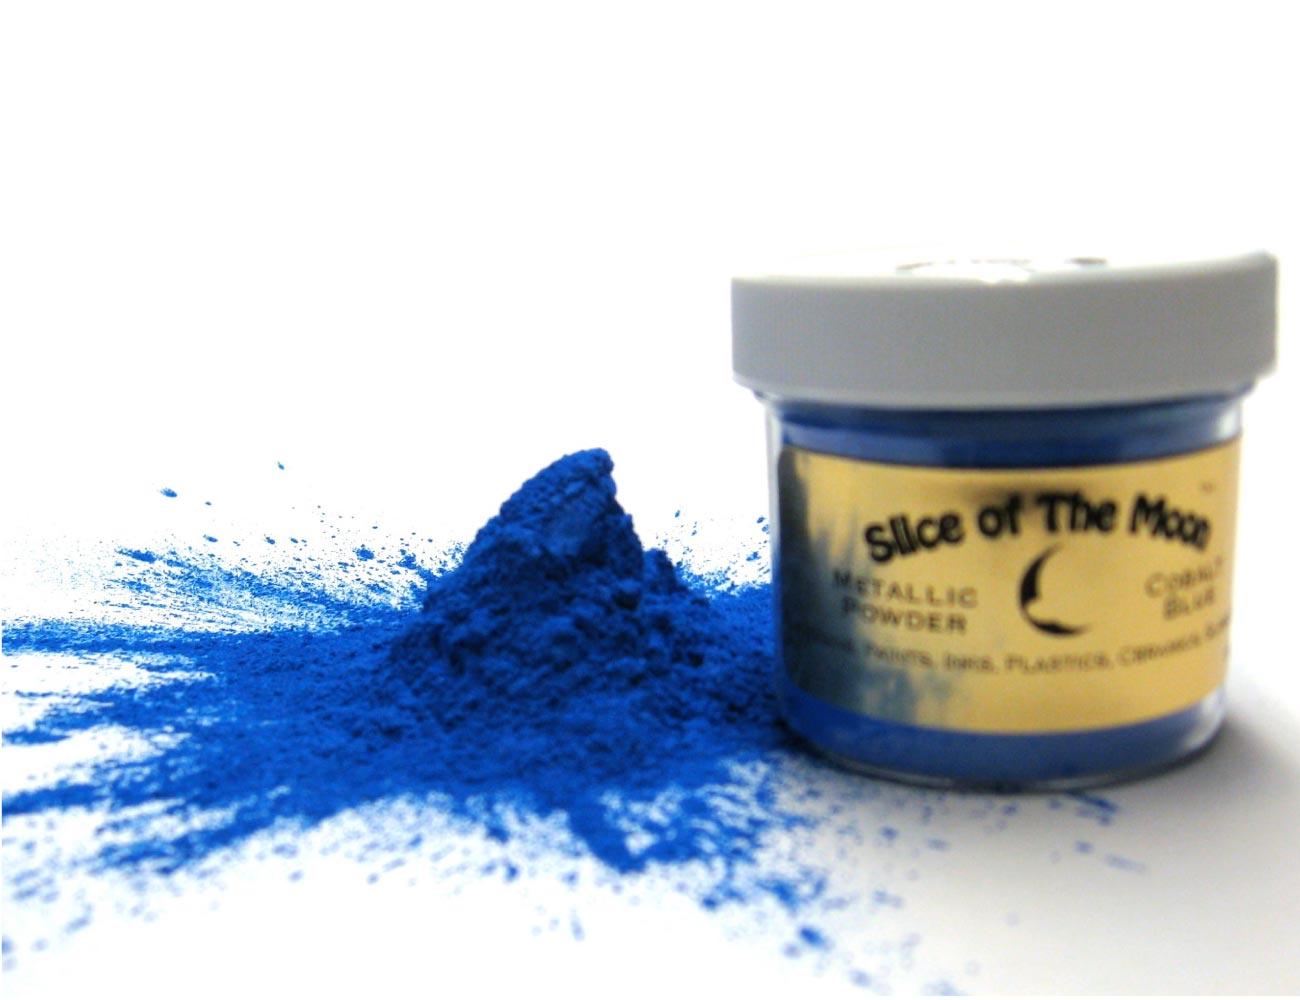 Cobalt Blue Mica Powder 1oz, Metallic Blue Powder,